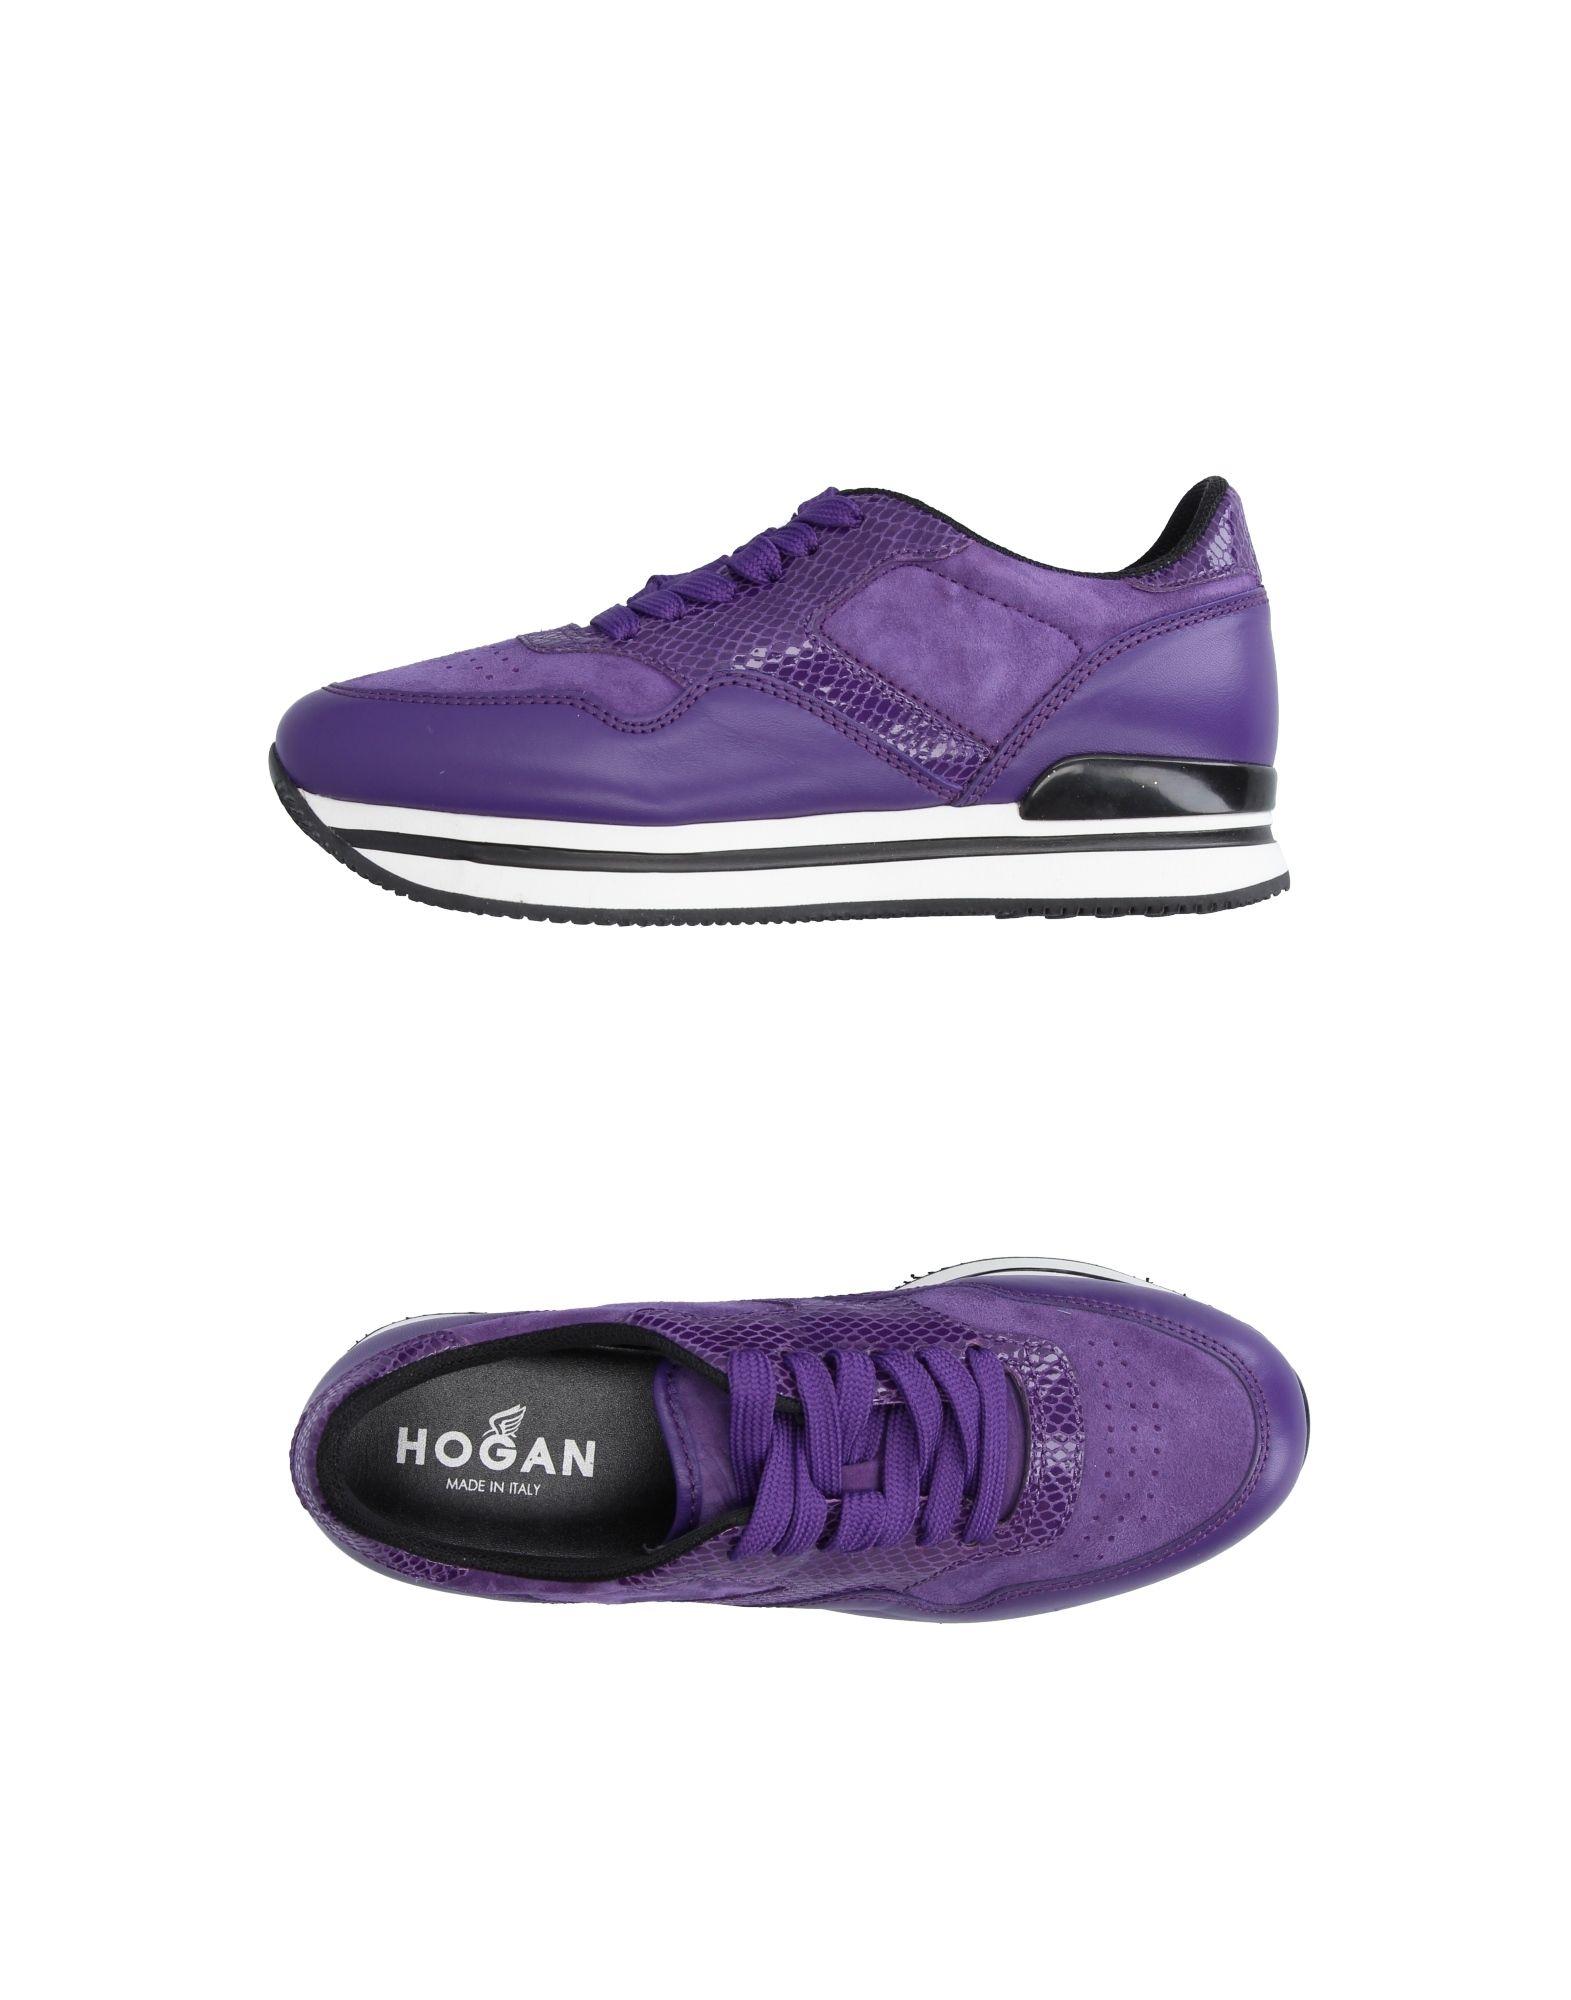 Moda Sneakers Hogan Donna - 11214614UI